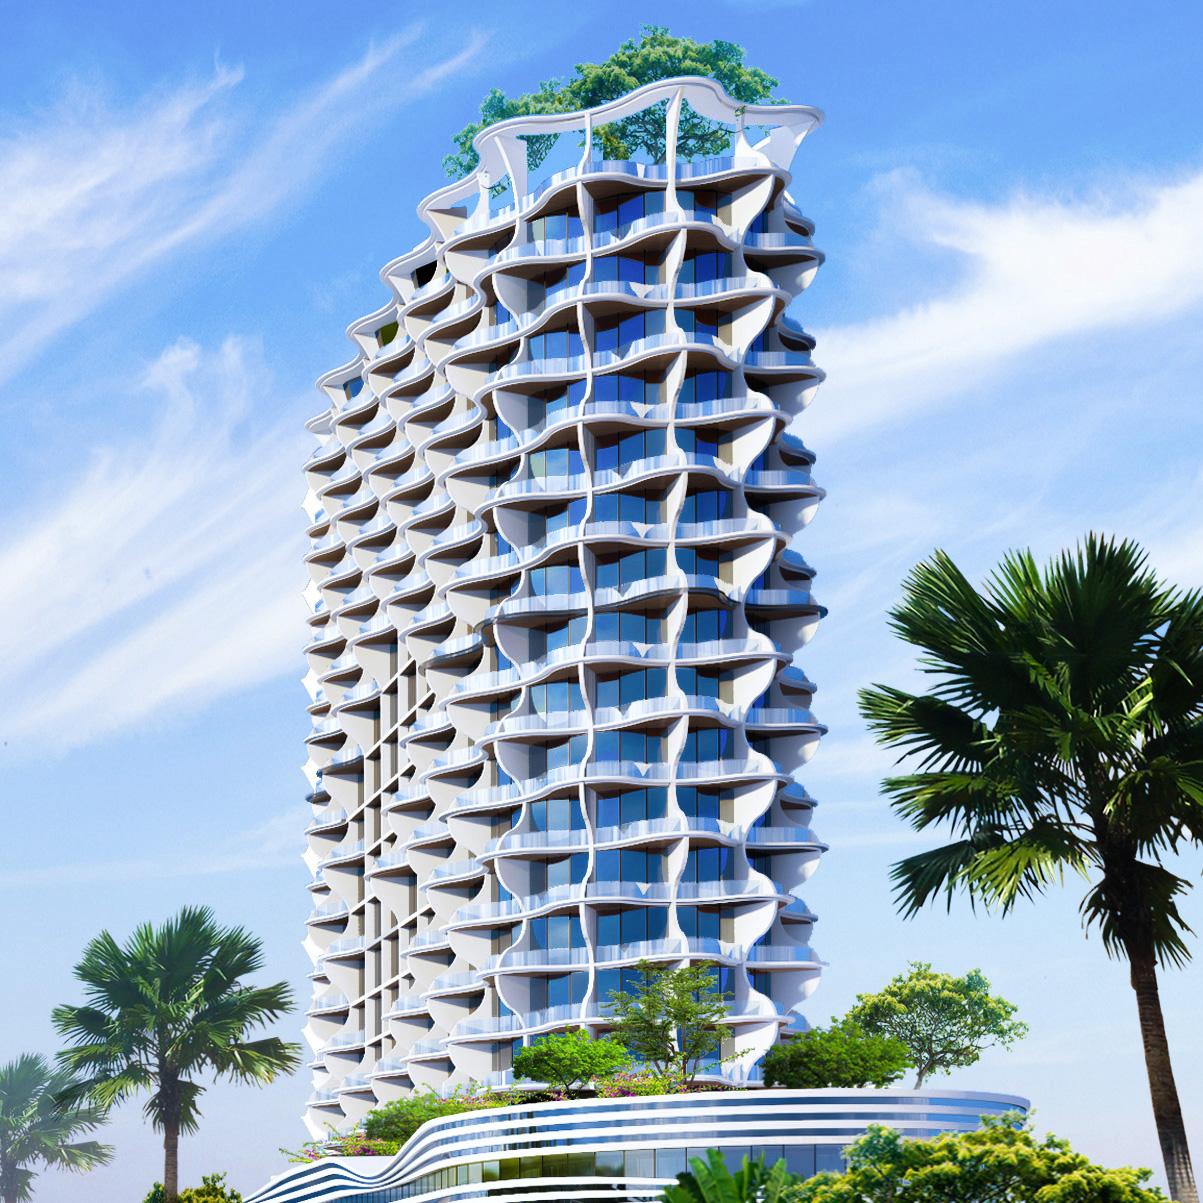 HOTEL COMPLEX 5 STARS